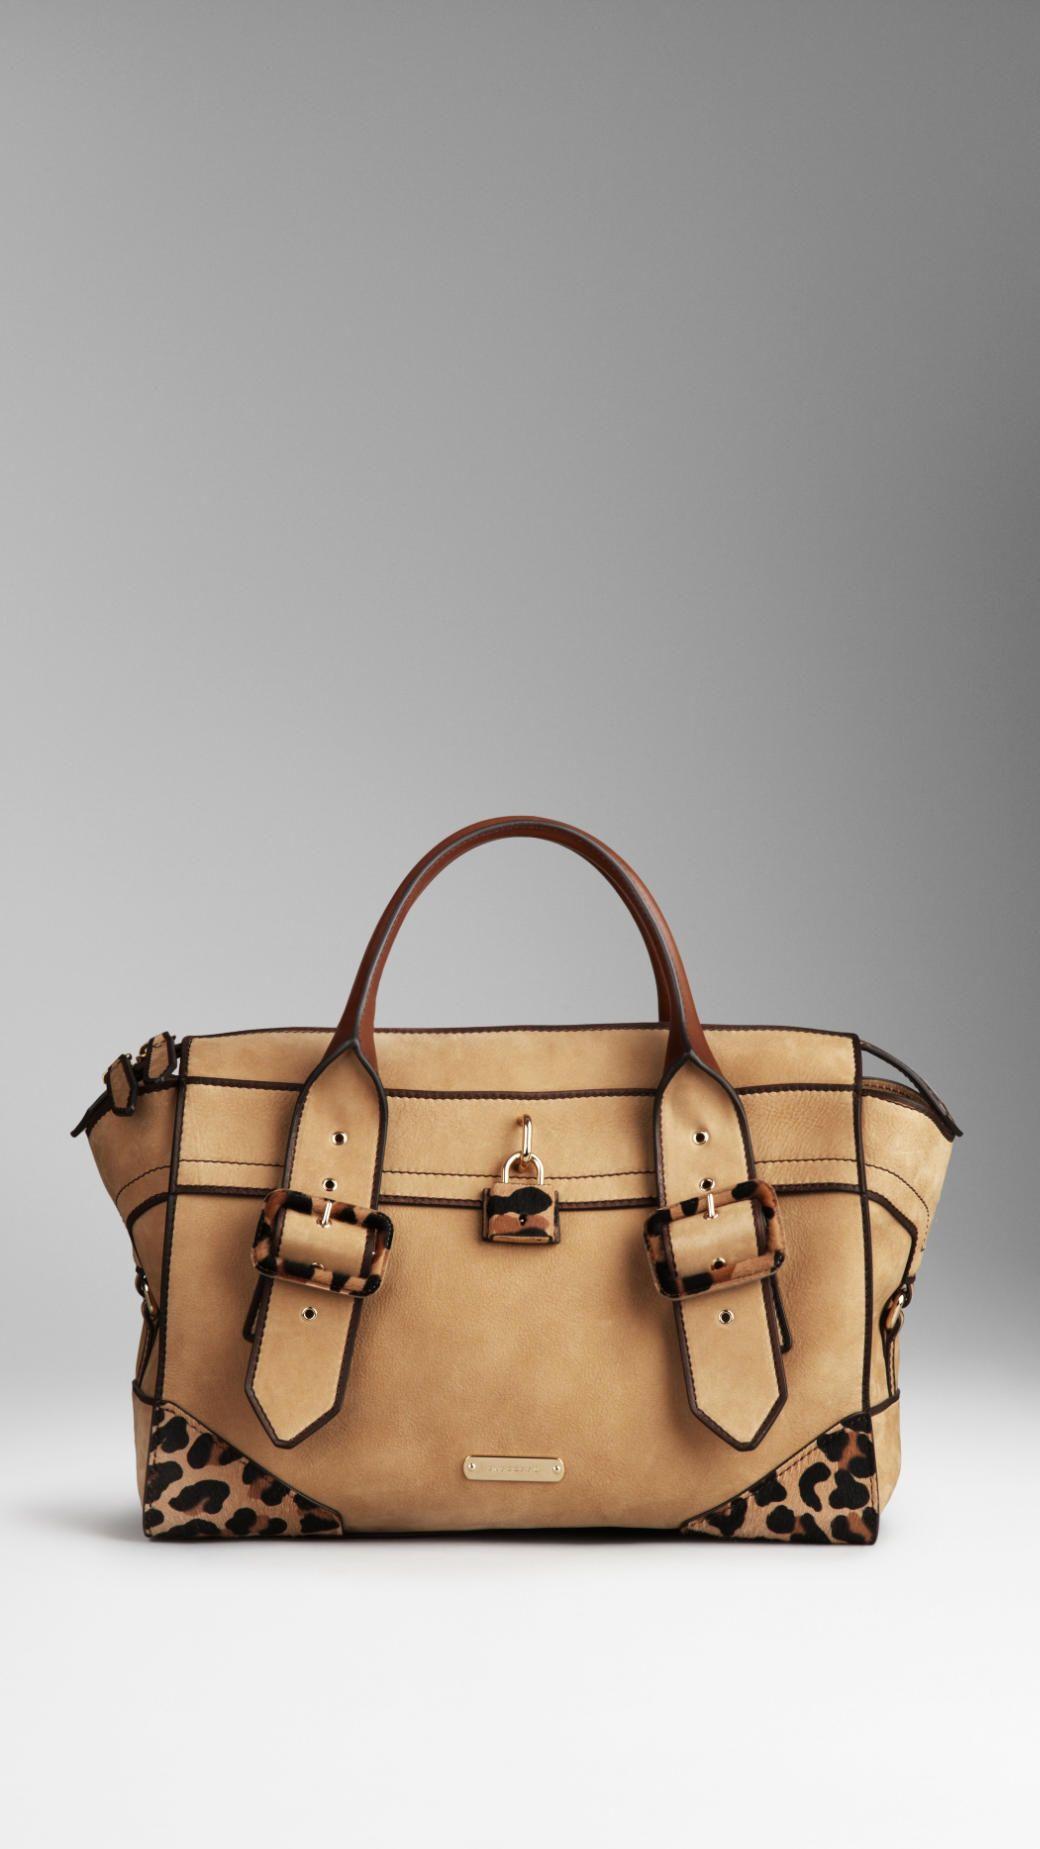 f0f144bfe Women's Handbags & Purses | Things I want! | Bags, Bag Accessories ...